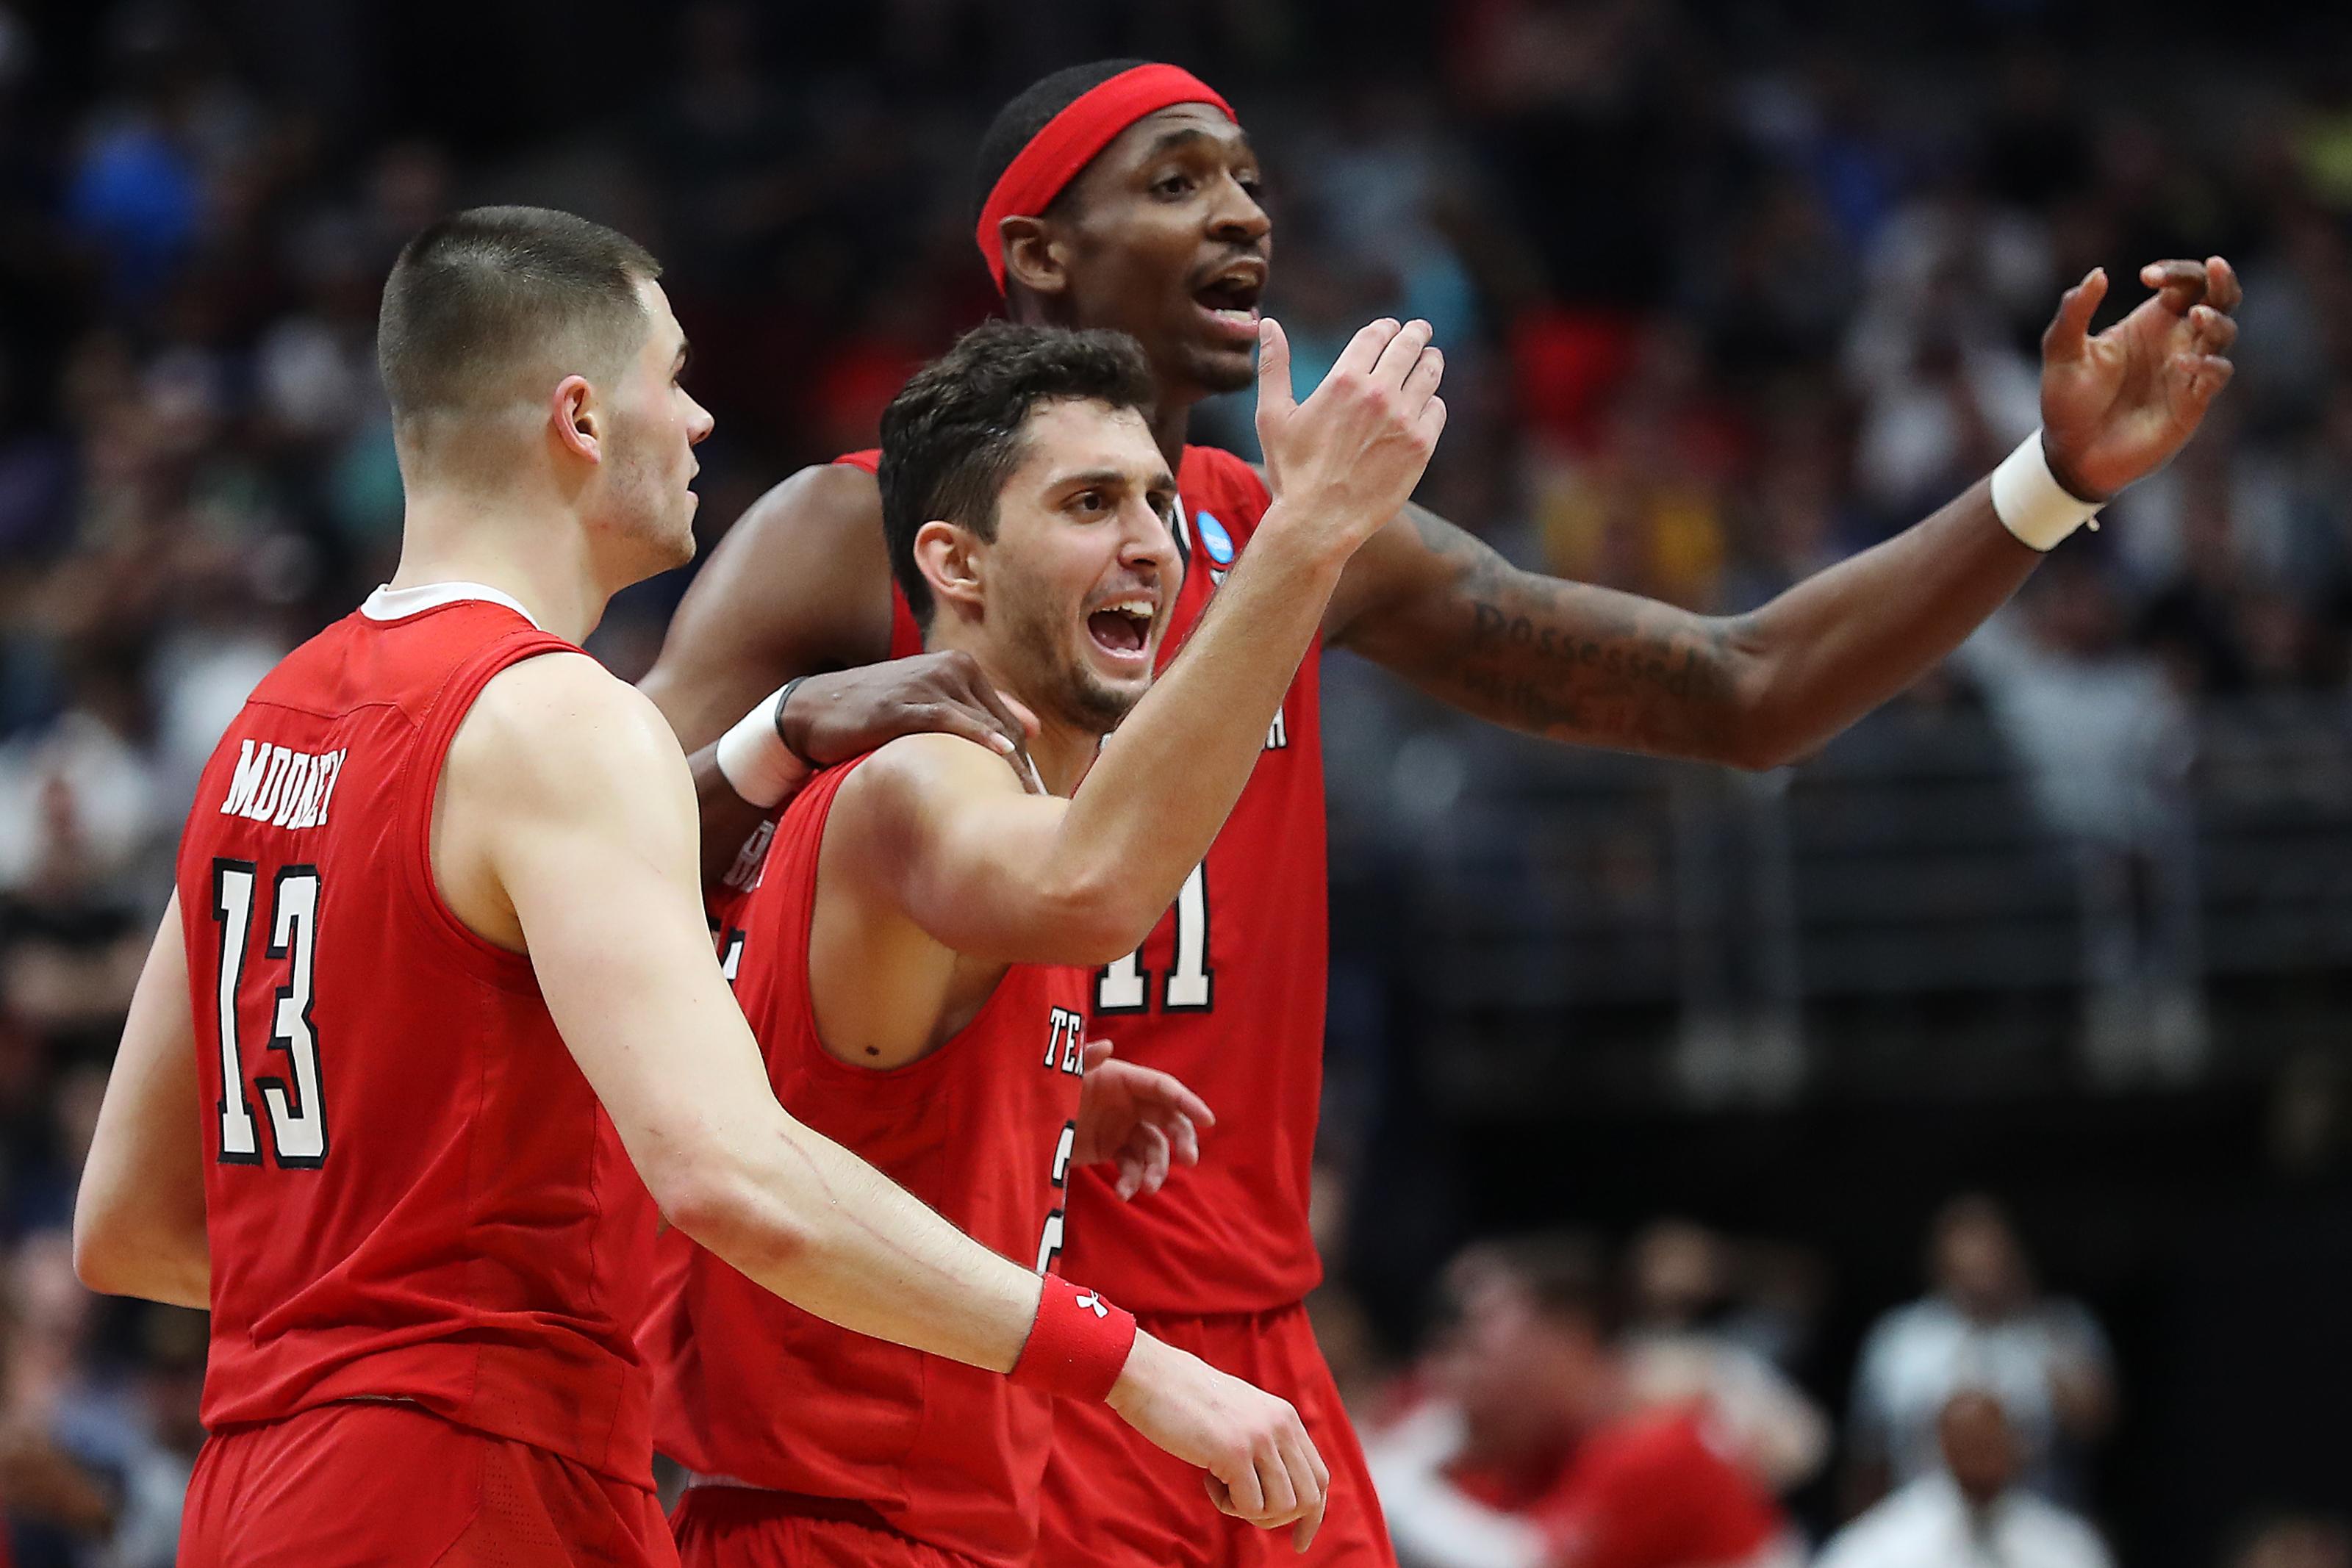 Texas Tech basketball: Former players react to Mark Adams' hiring